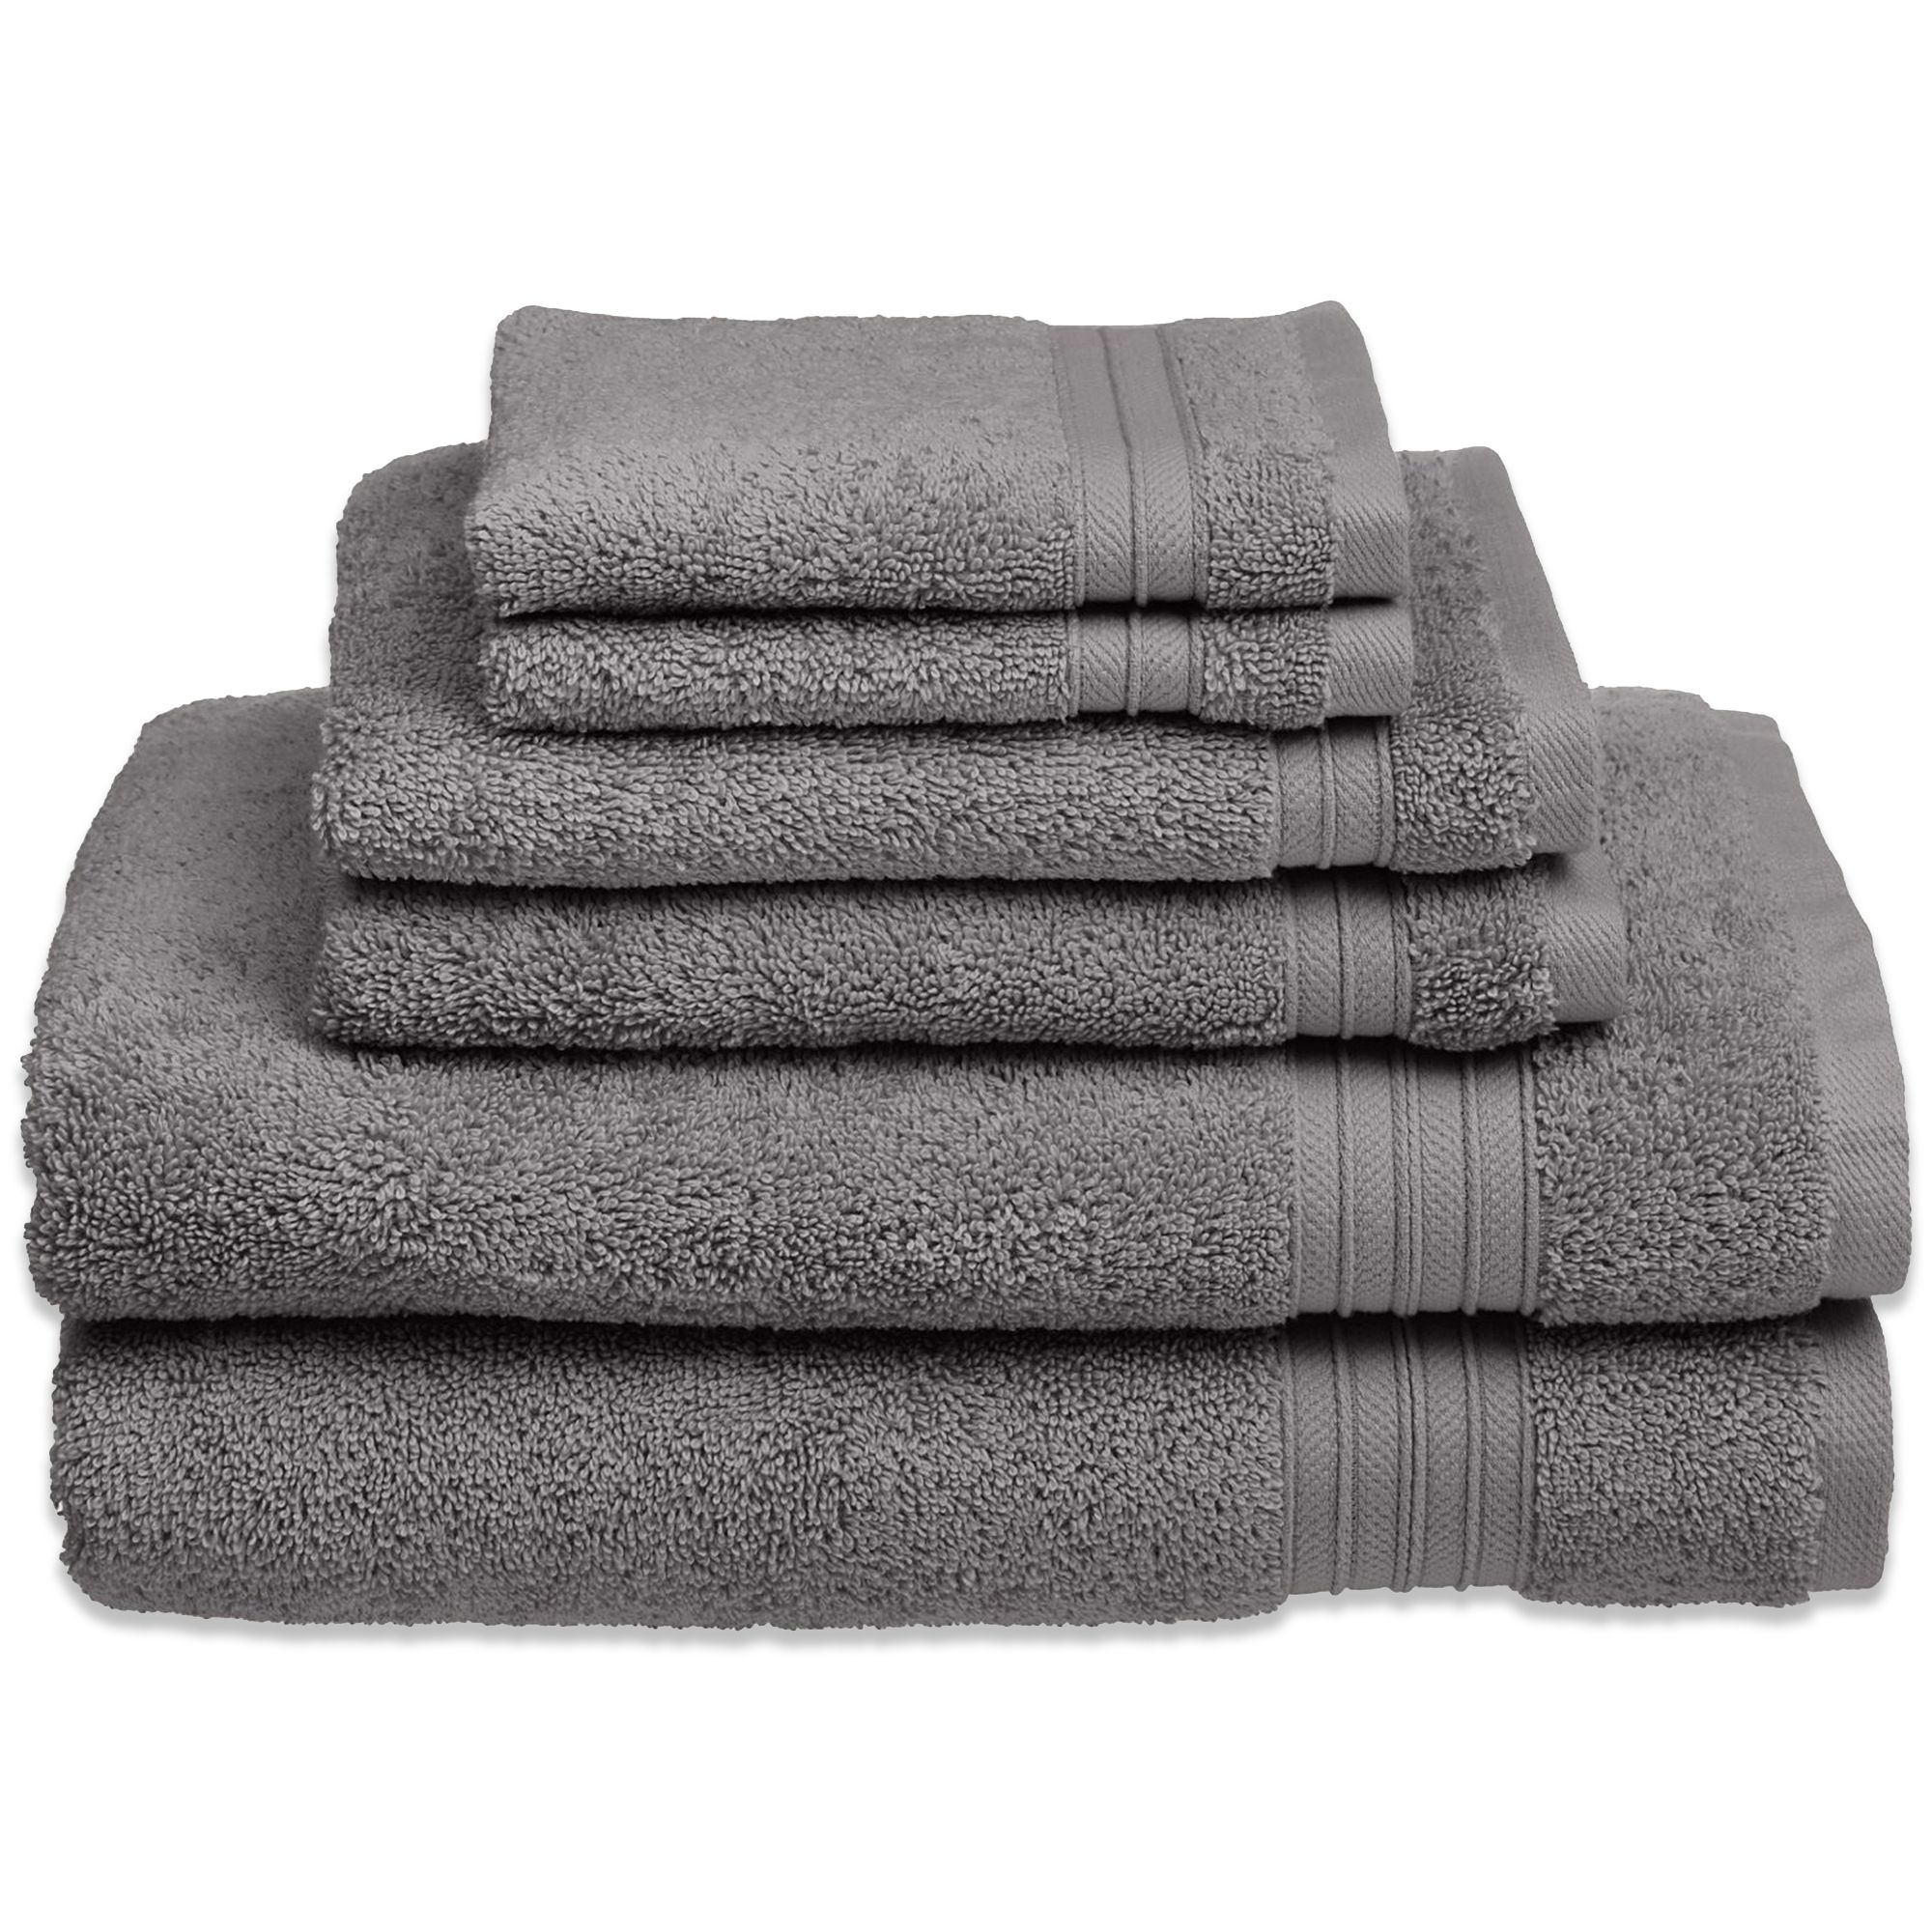 Bath Towels Beach Towels